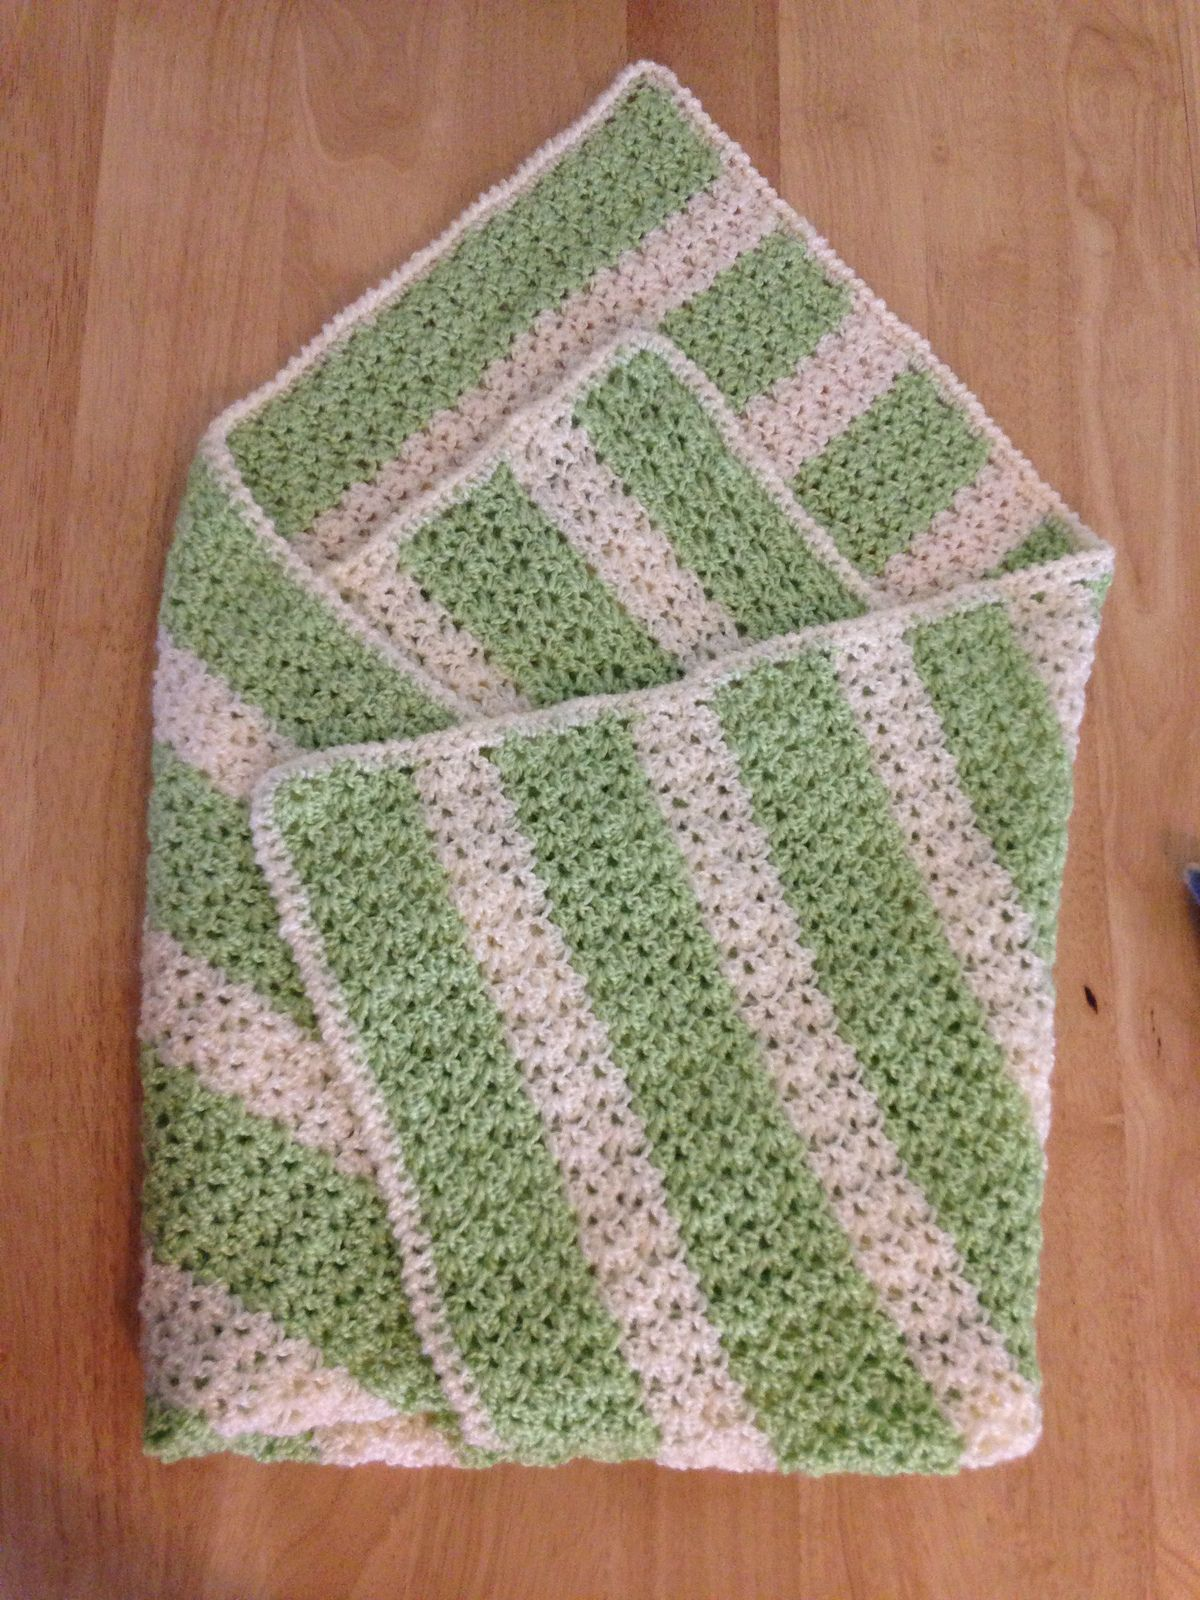 Baby\'s Best Bumpy Blanket By Tanya Nasar - Free Crochet Pattern ...